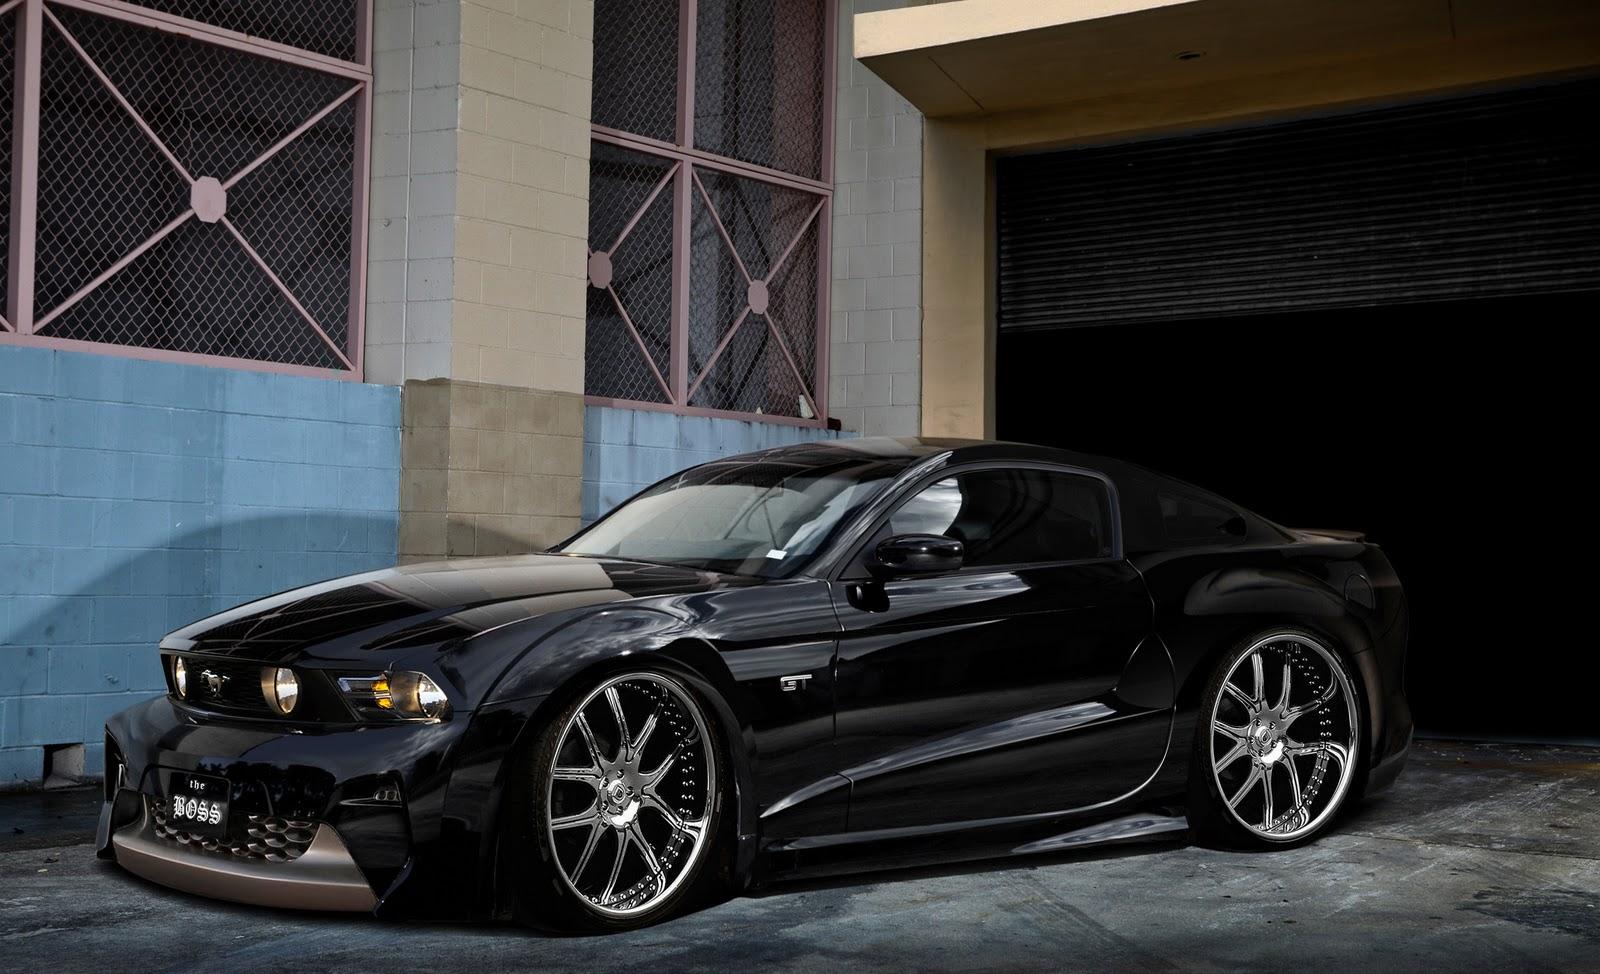 Wongseng Hd Wallpapers Black Mustang Cool Hd Wallpaper